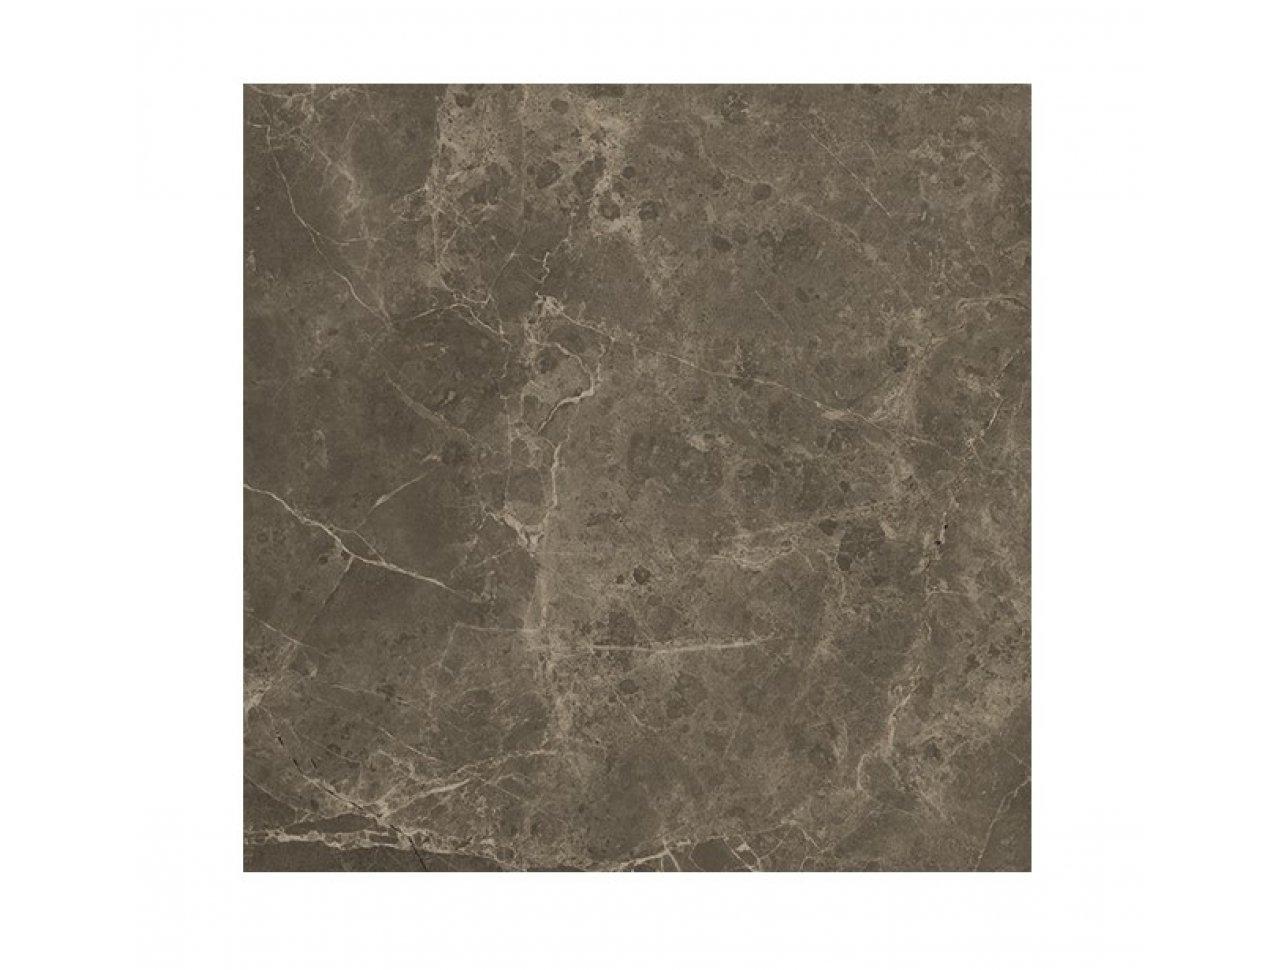 Напольная плитка FAP Roma Imperiale 20 x 20 см, Арт. fLX3